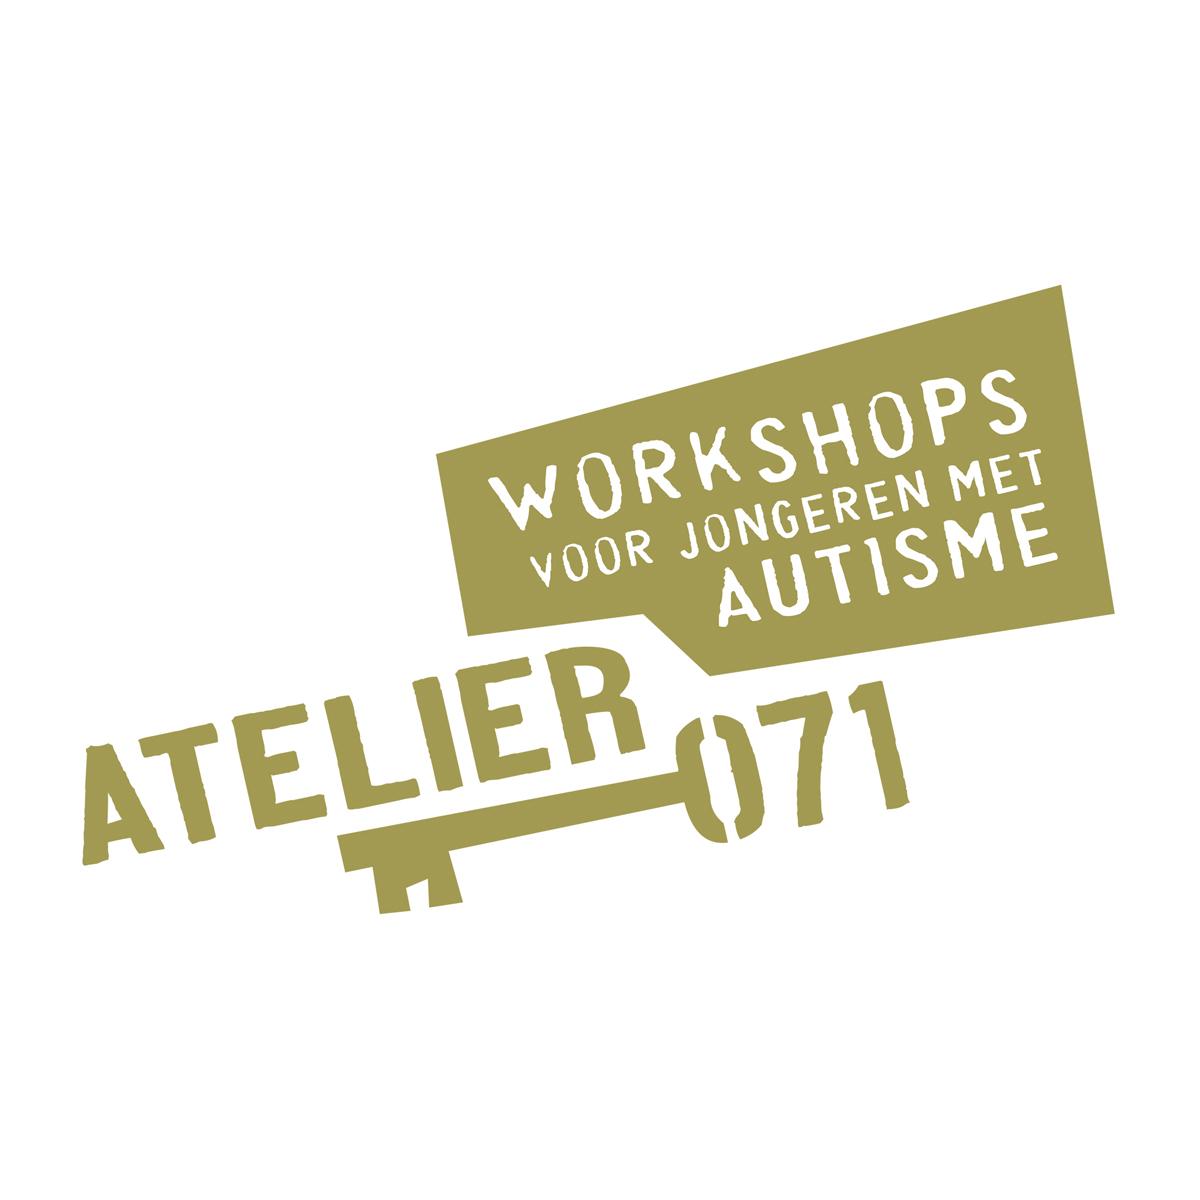 Atelier 071 - Logo